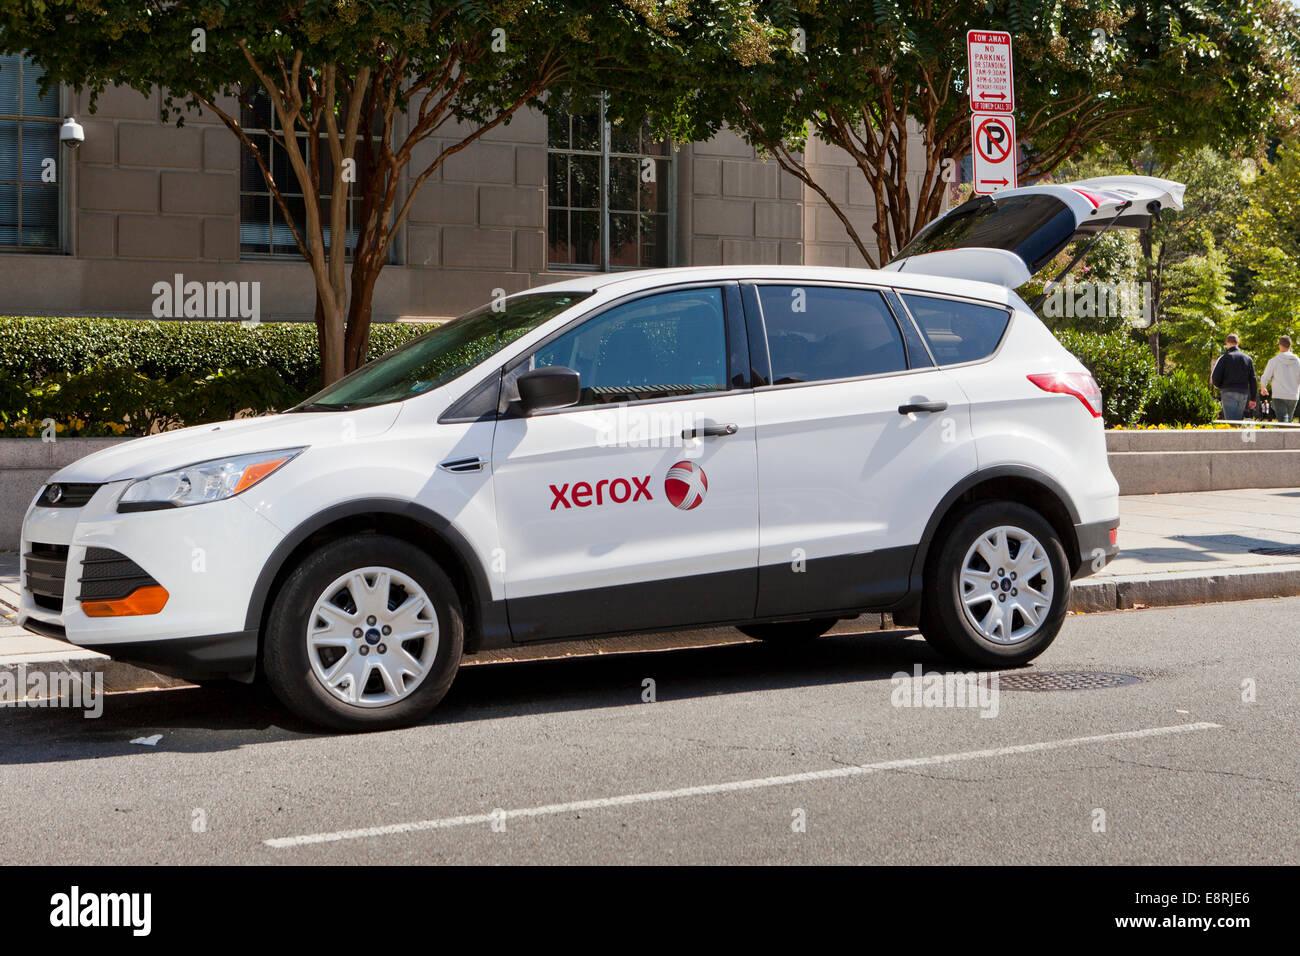 Xeroxpany Service Vehicle  Washington, Dc Usa  Stock Image